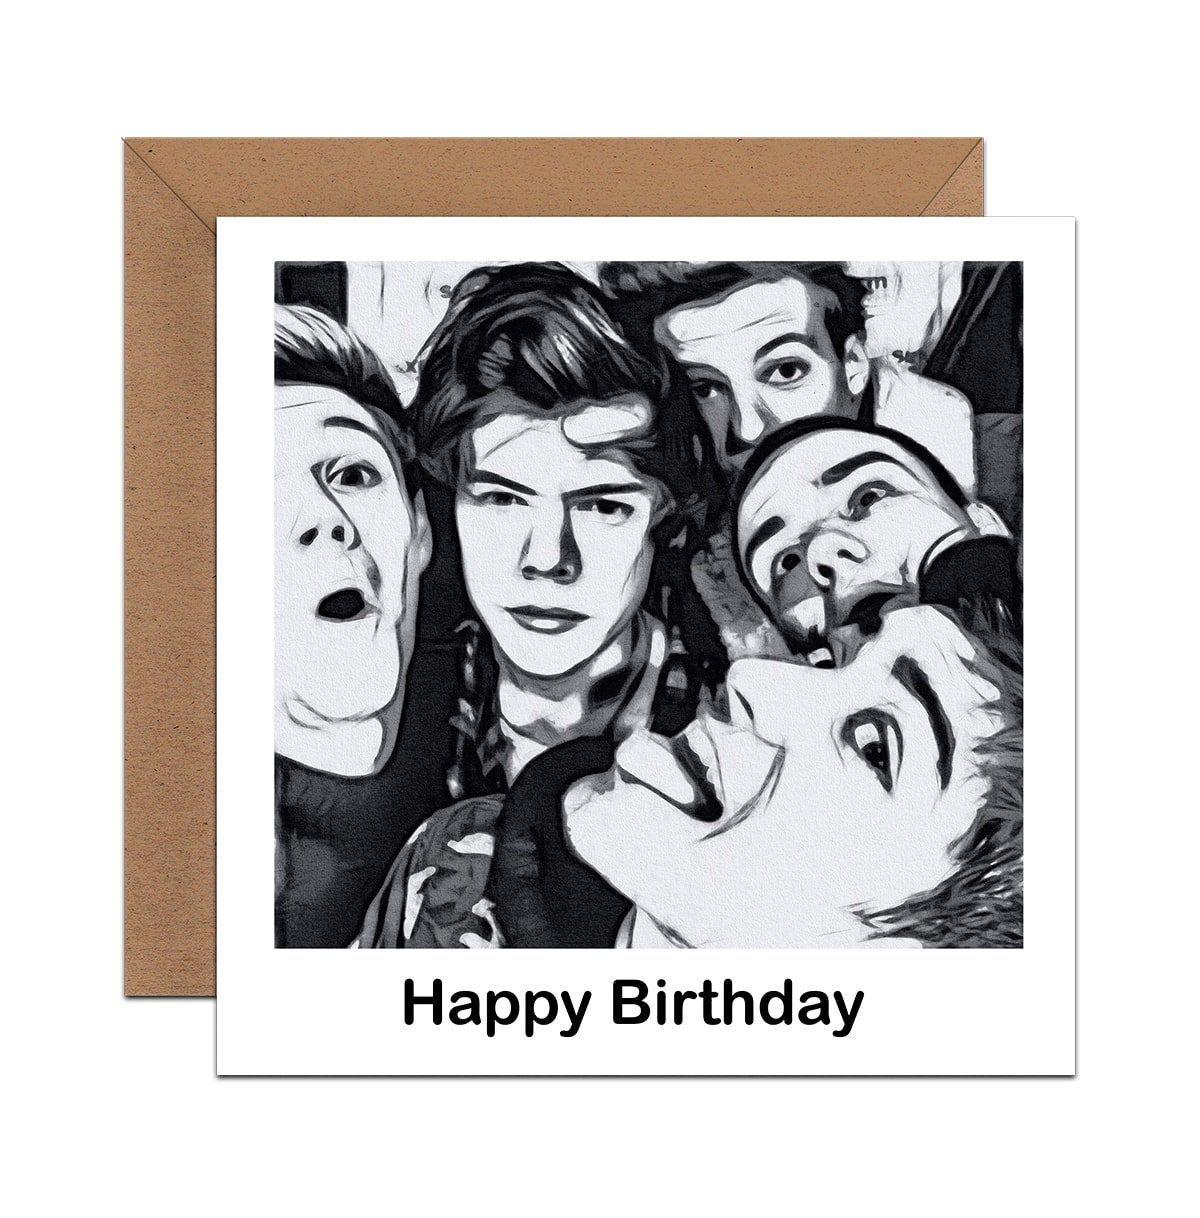 Harry Styles Birthday Card In 2021 Harry Styles Birthday 16th Birthday Card Birthday Cards